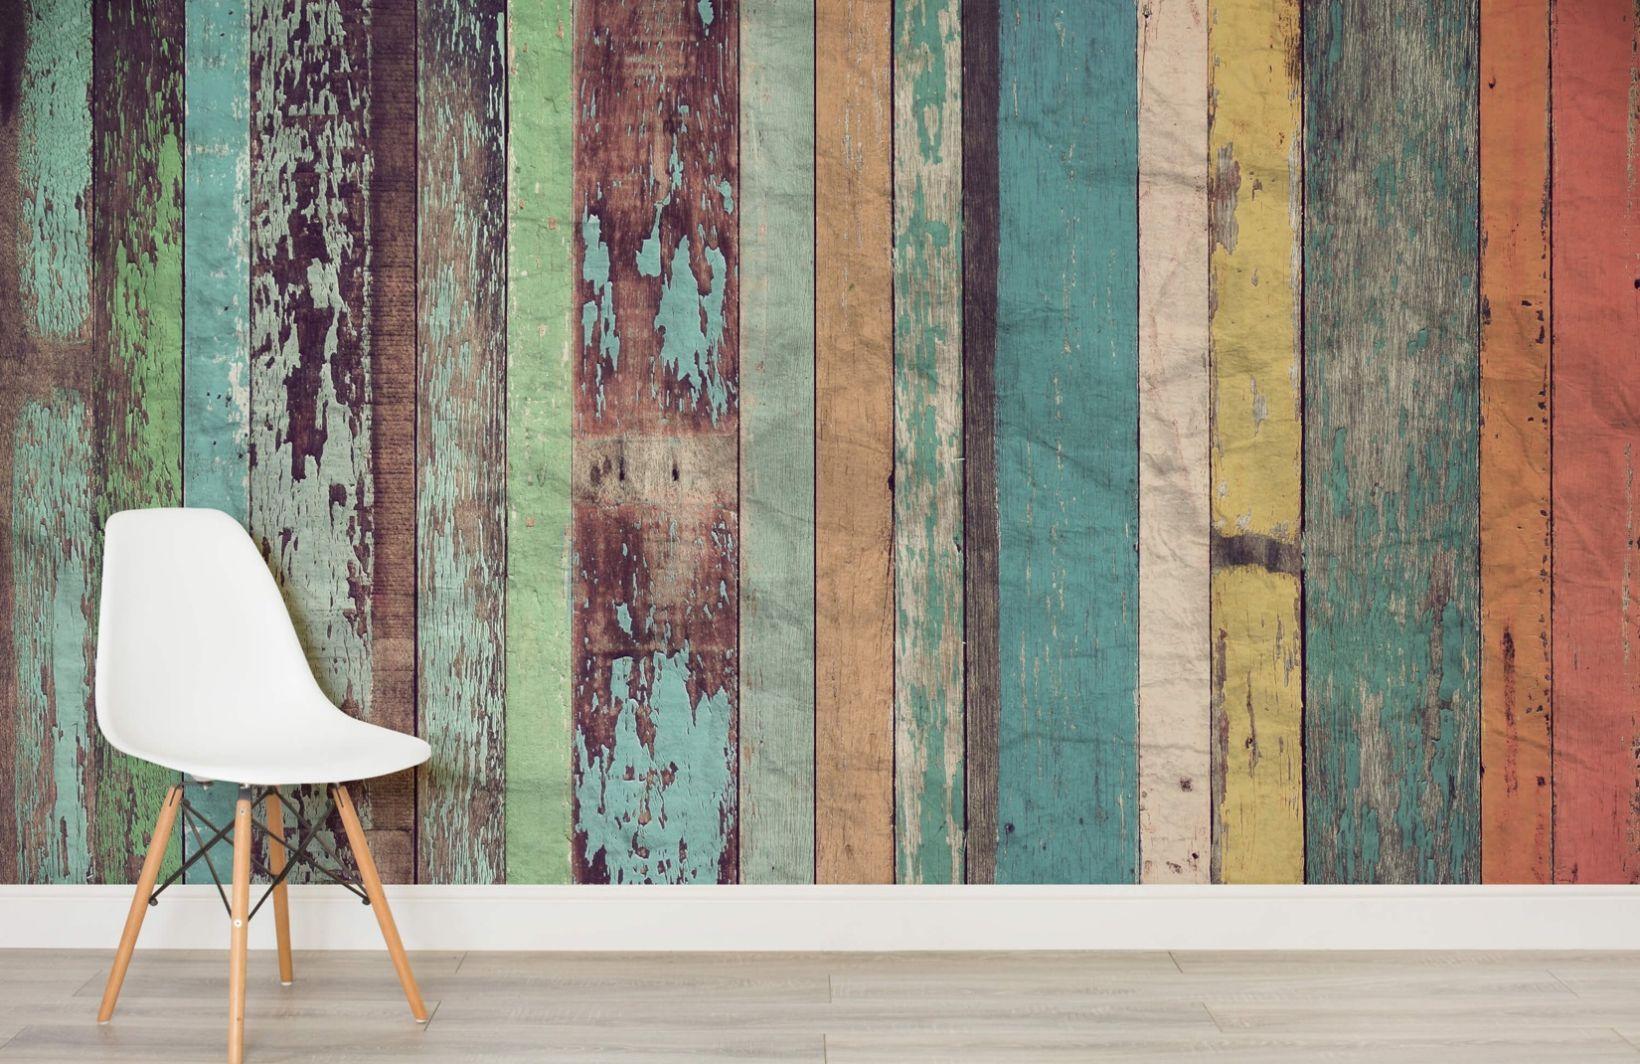 Worn Coloured Wood Wall Mural in 2020 Wood wallpaper